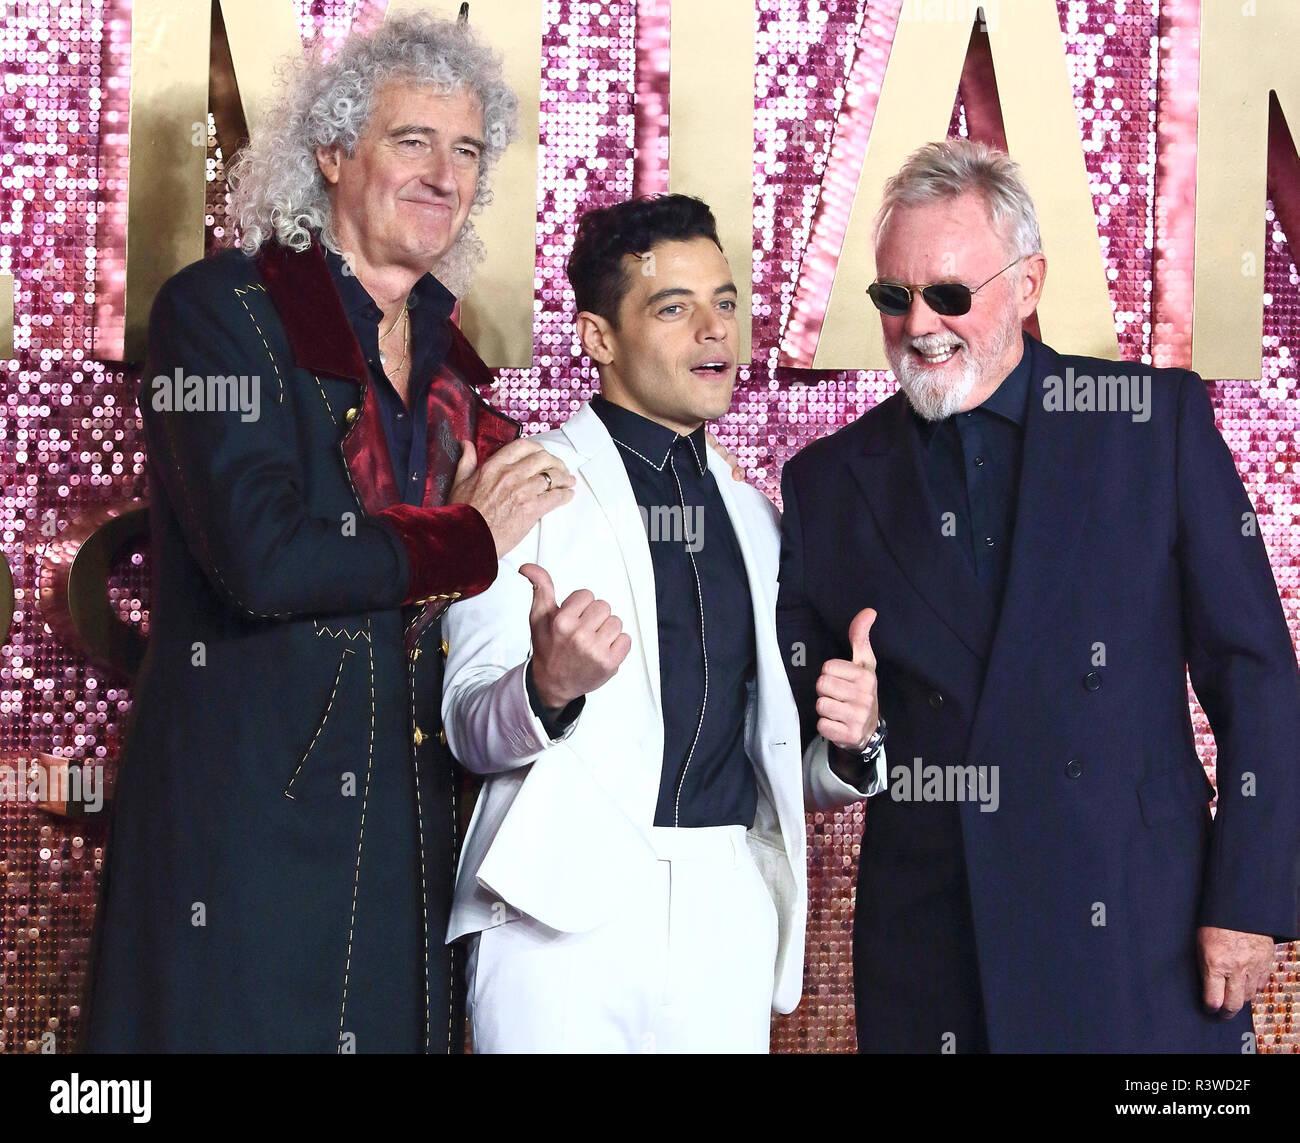 Bohemian Rhapsody UK Premiere al SSE Wembley Arena, Londra dotata: Brian May, Rami Malek, Roger Taylor dove: Londra, Regno Unito quando: 23 Ott 2018 Credit: WENN.com Immagini Stock